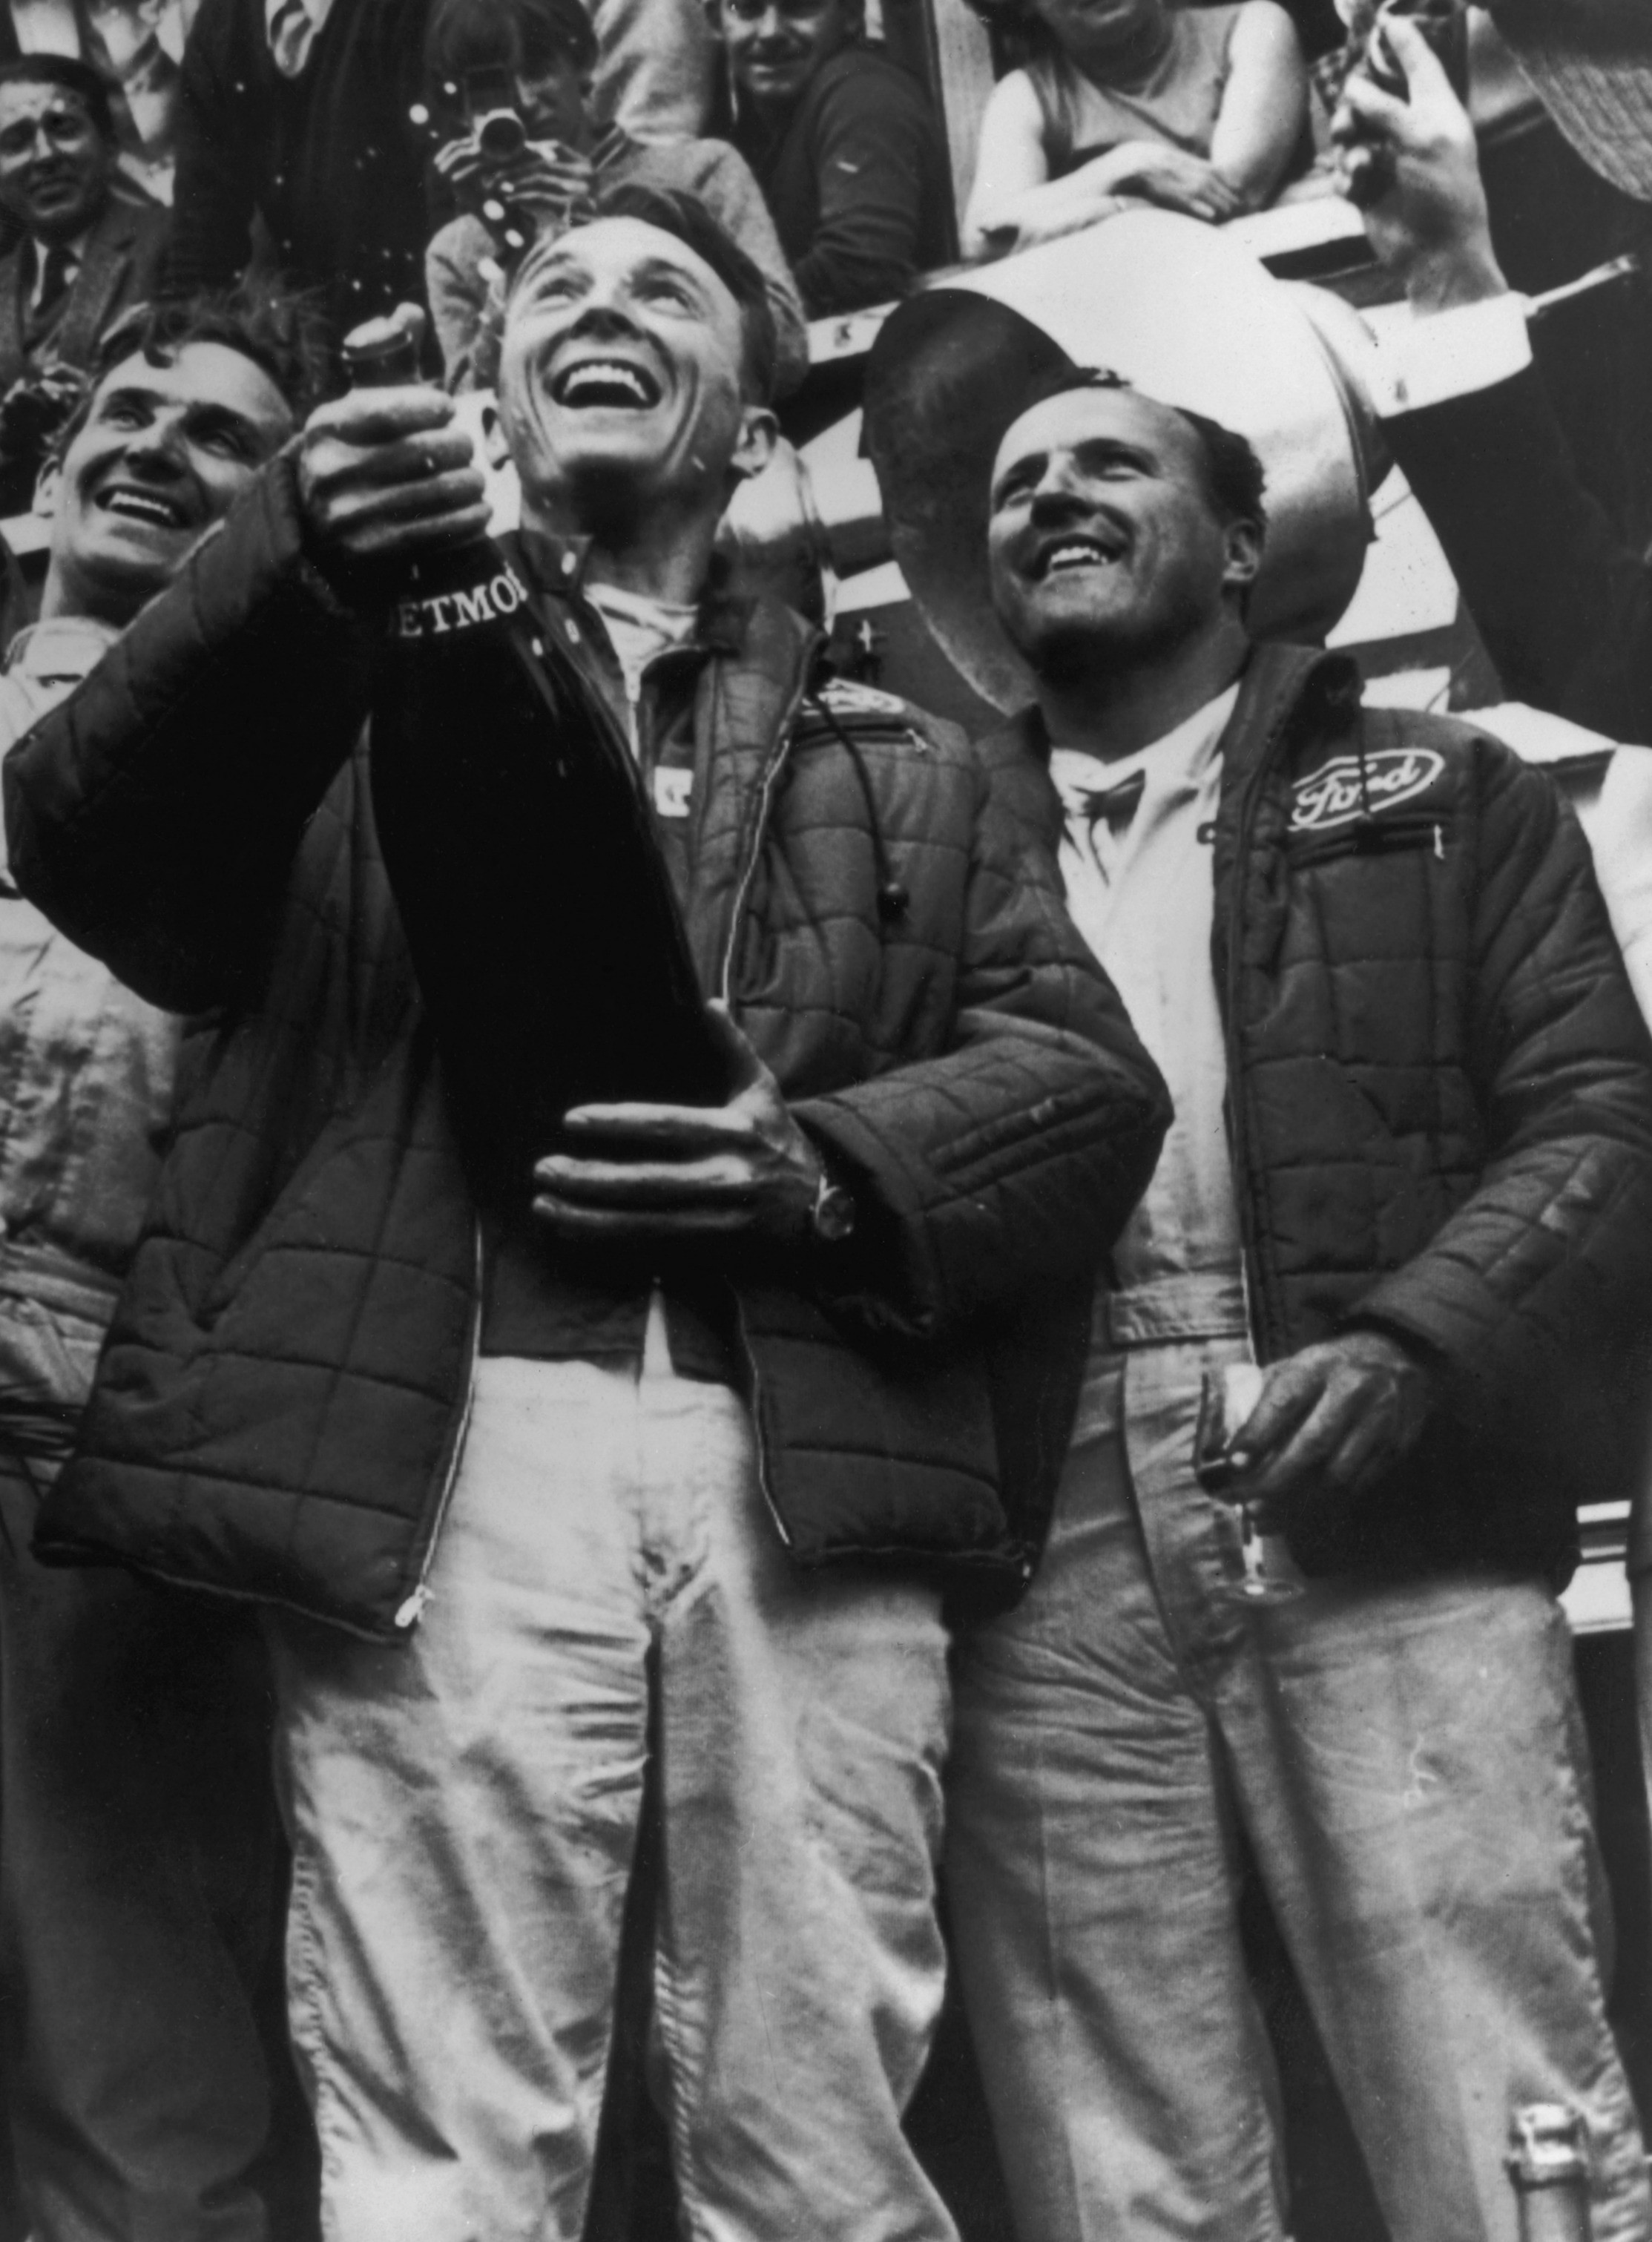 Dan Gurney et Anthony Foyt (Ford) vainqueurs des 24 Heures du Mans 1967